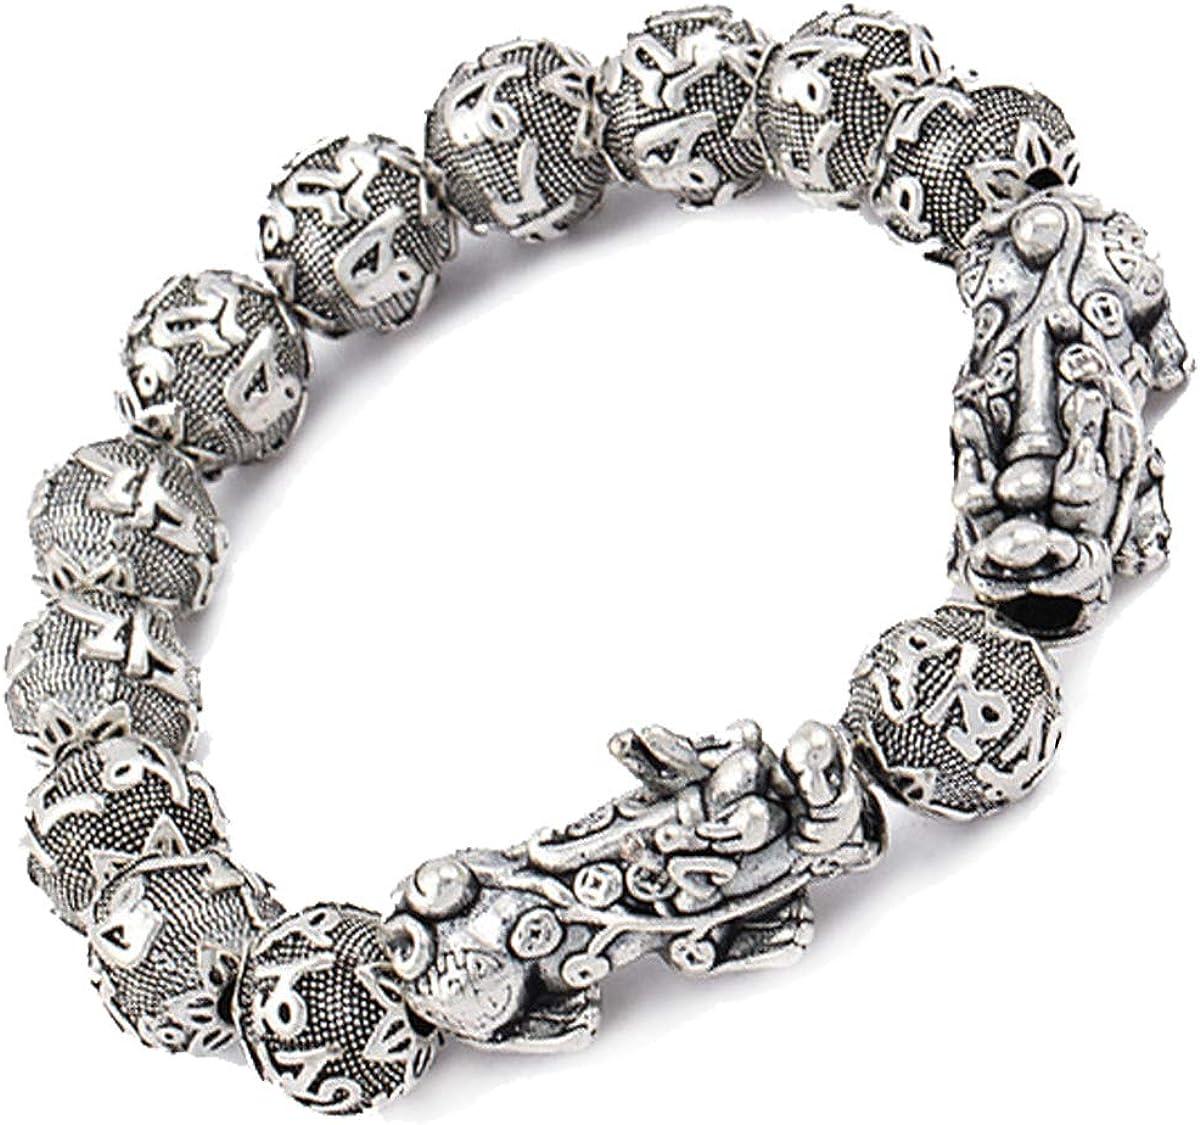 Feng Shui Antique Silver Lucky National Wind pixiu Bracelet for Men pixiu bracelets